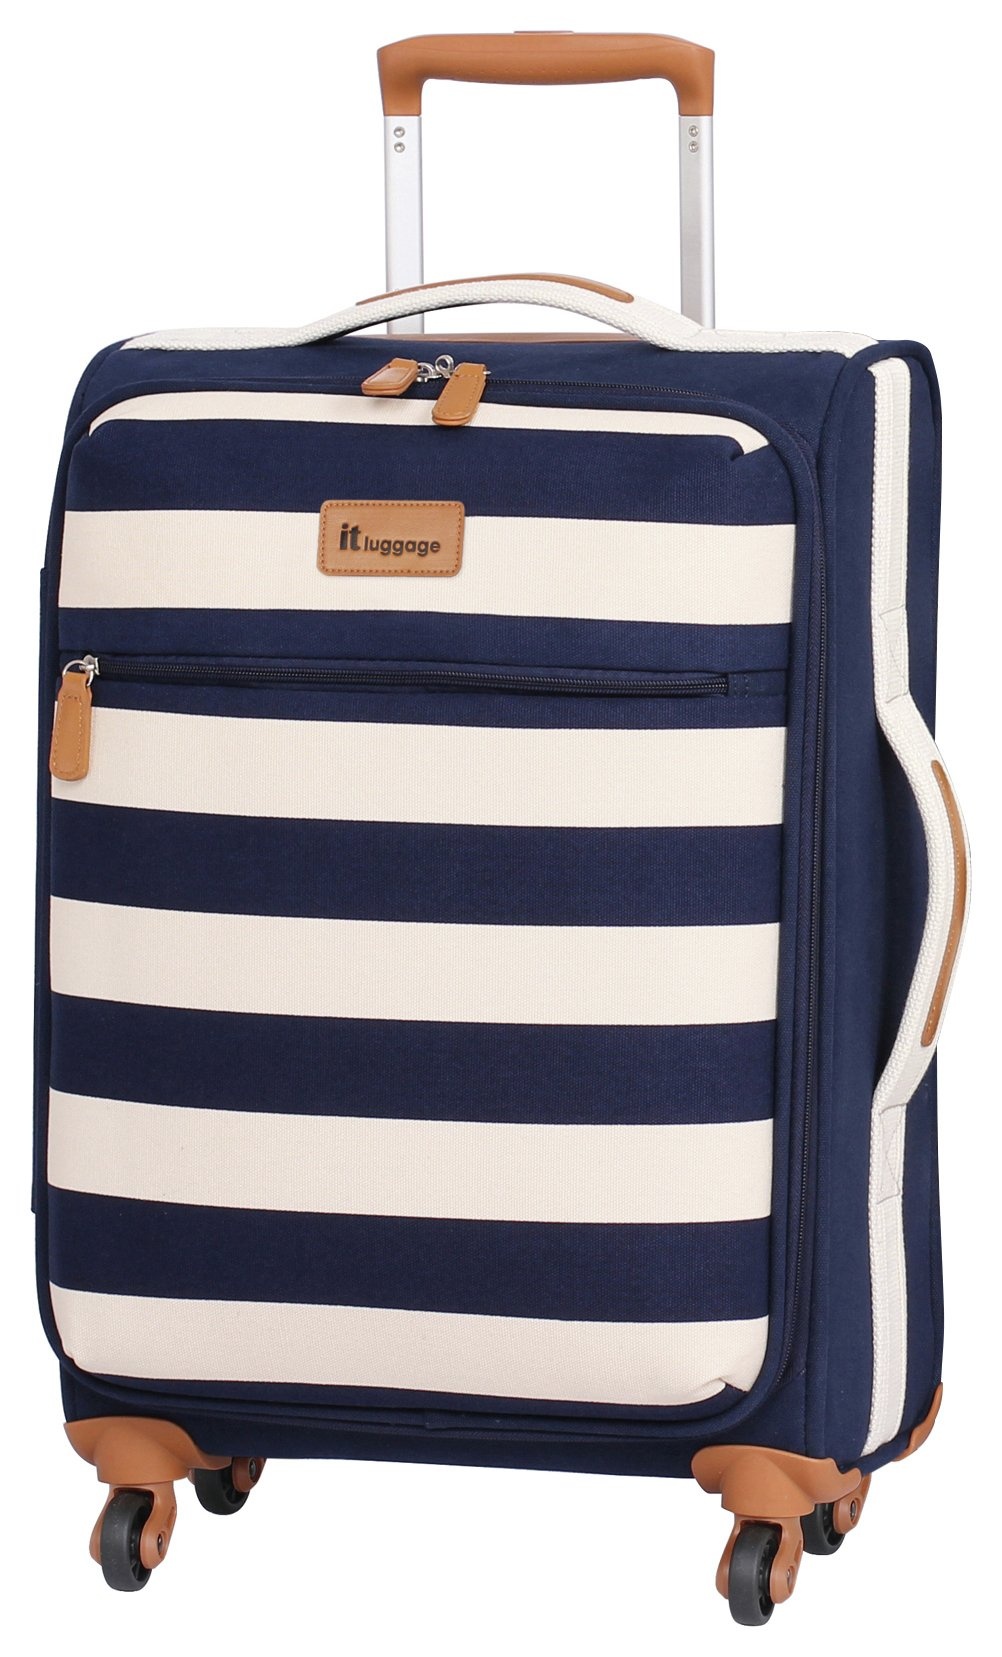 ec33ebeb1 IT Luggage Lightweight Small 4 Wheel Suitcase - Nautical (6039264) | Argos  Price Tracker | pricehistory.co.uk